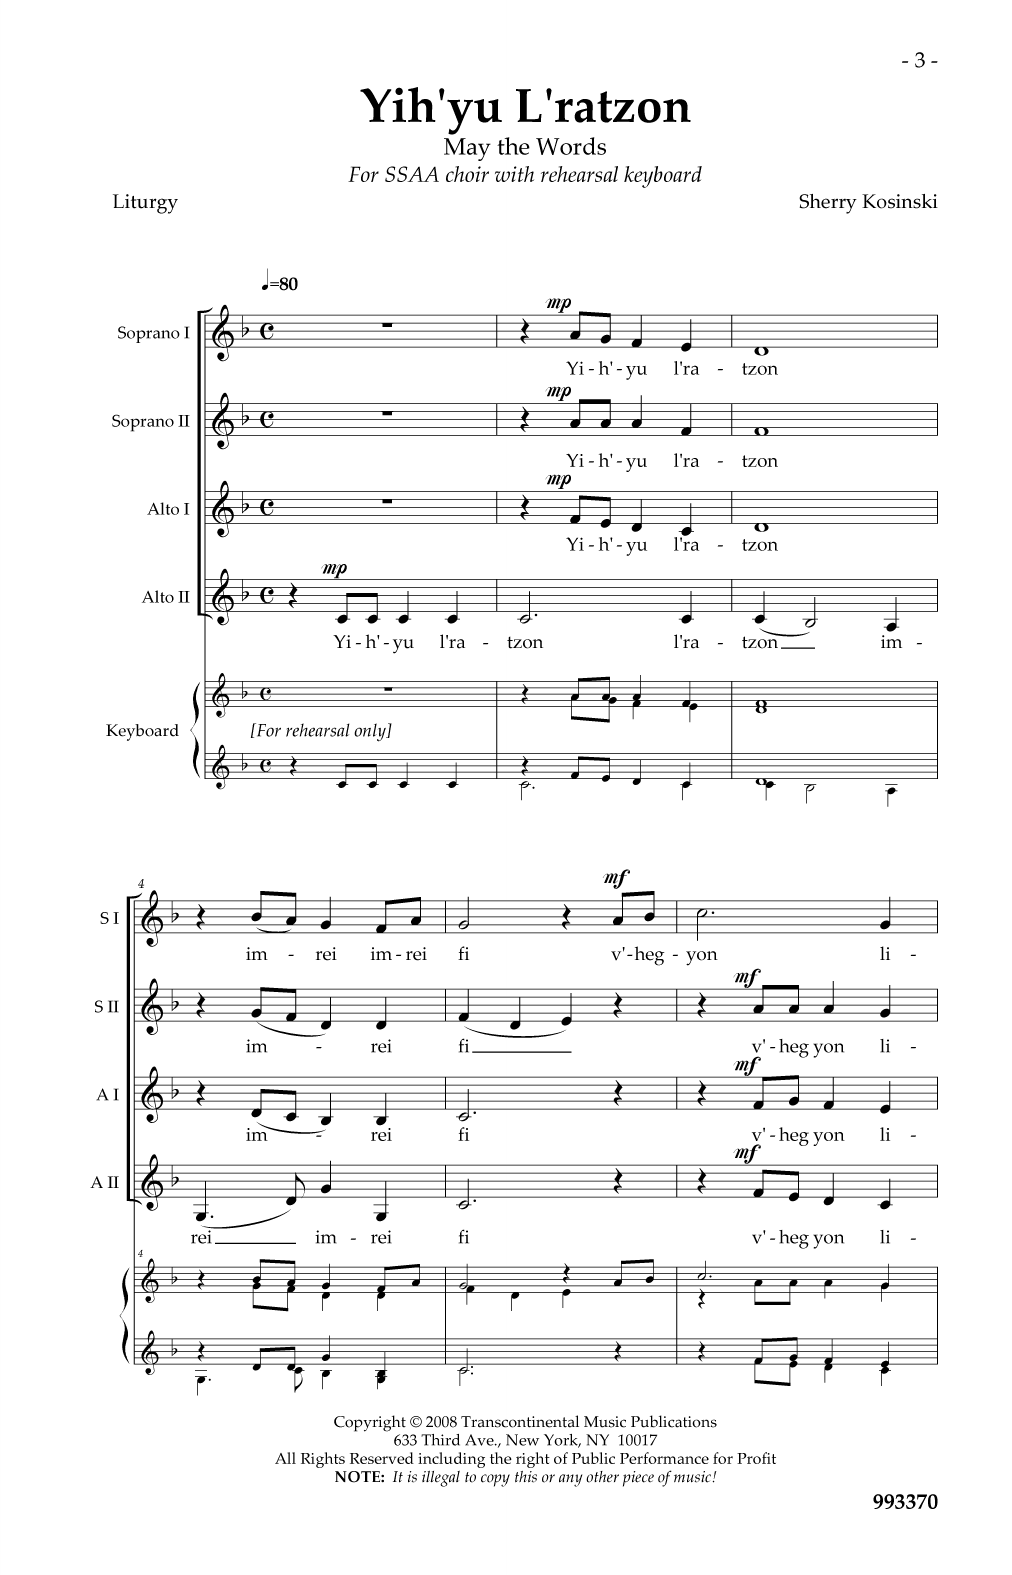 Yih'yu L'ratzon (May the Words) (SSAA Choir)